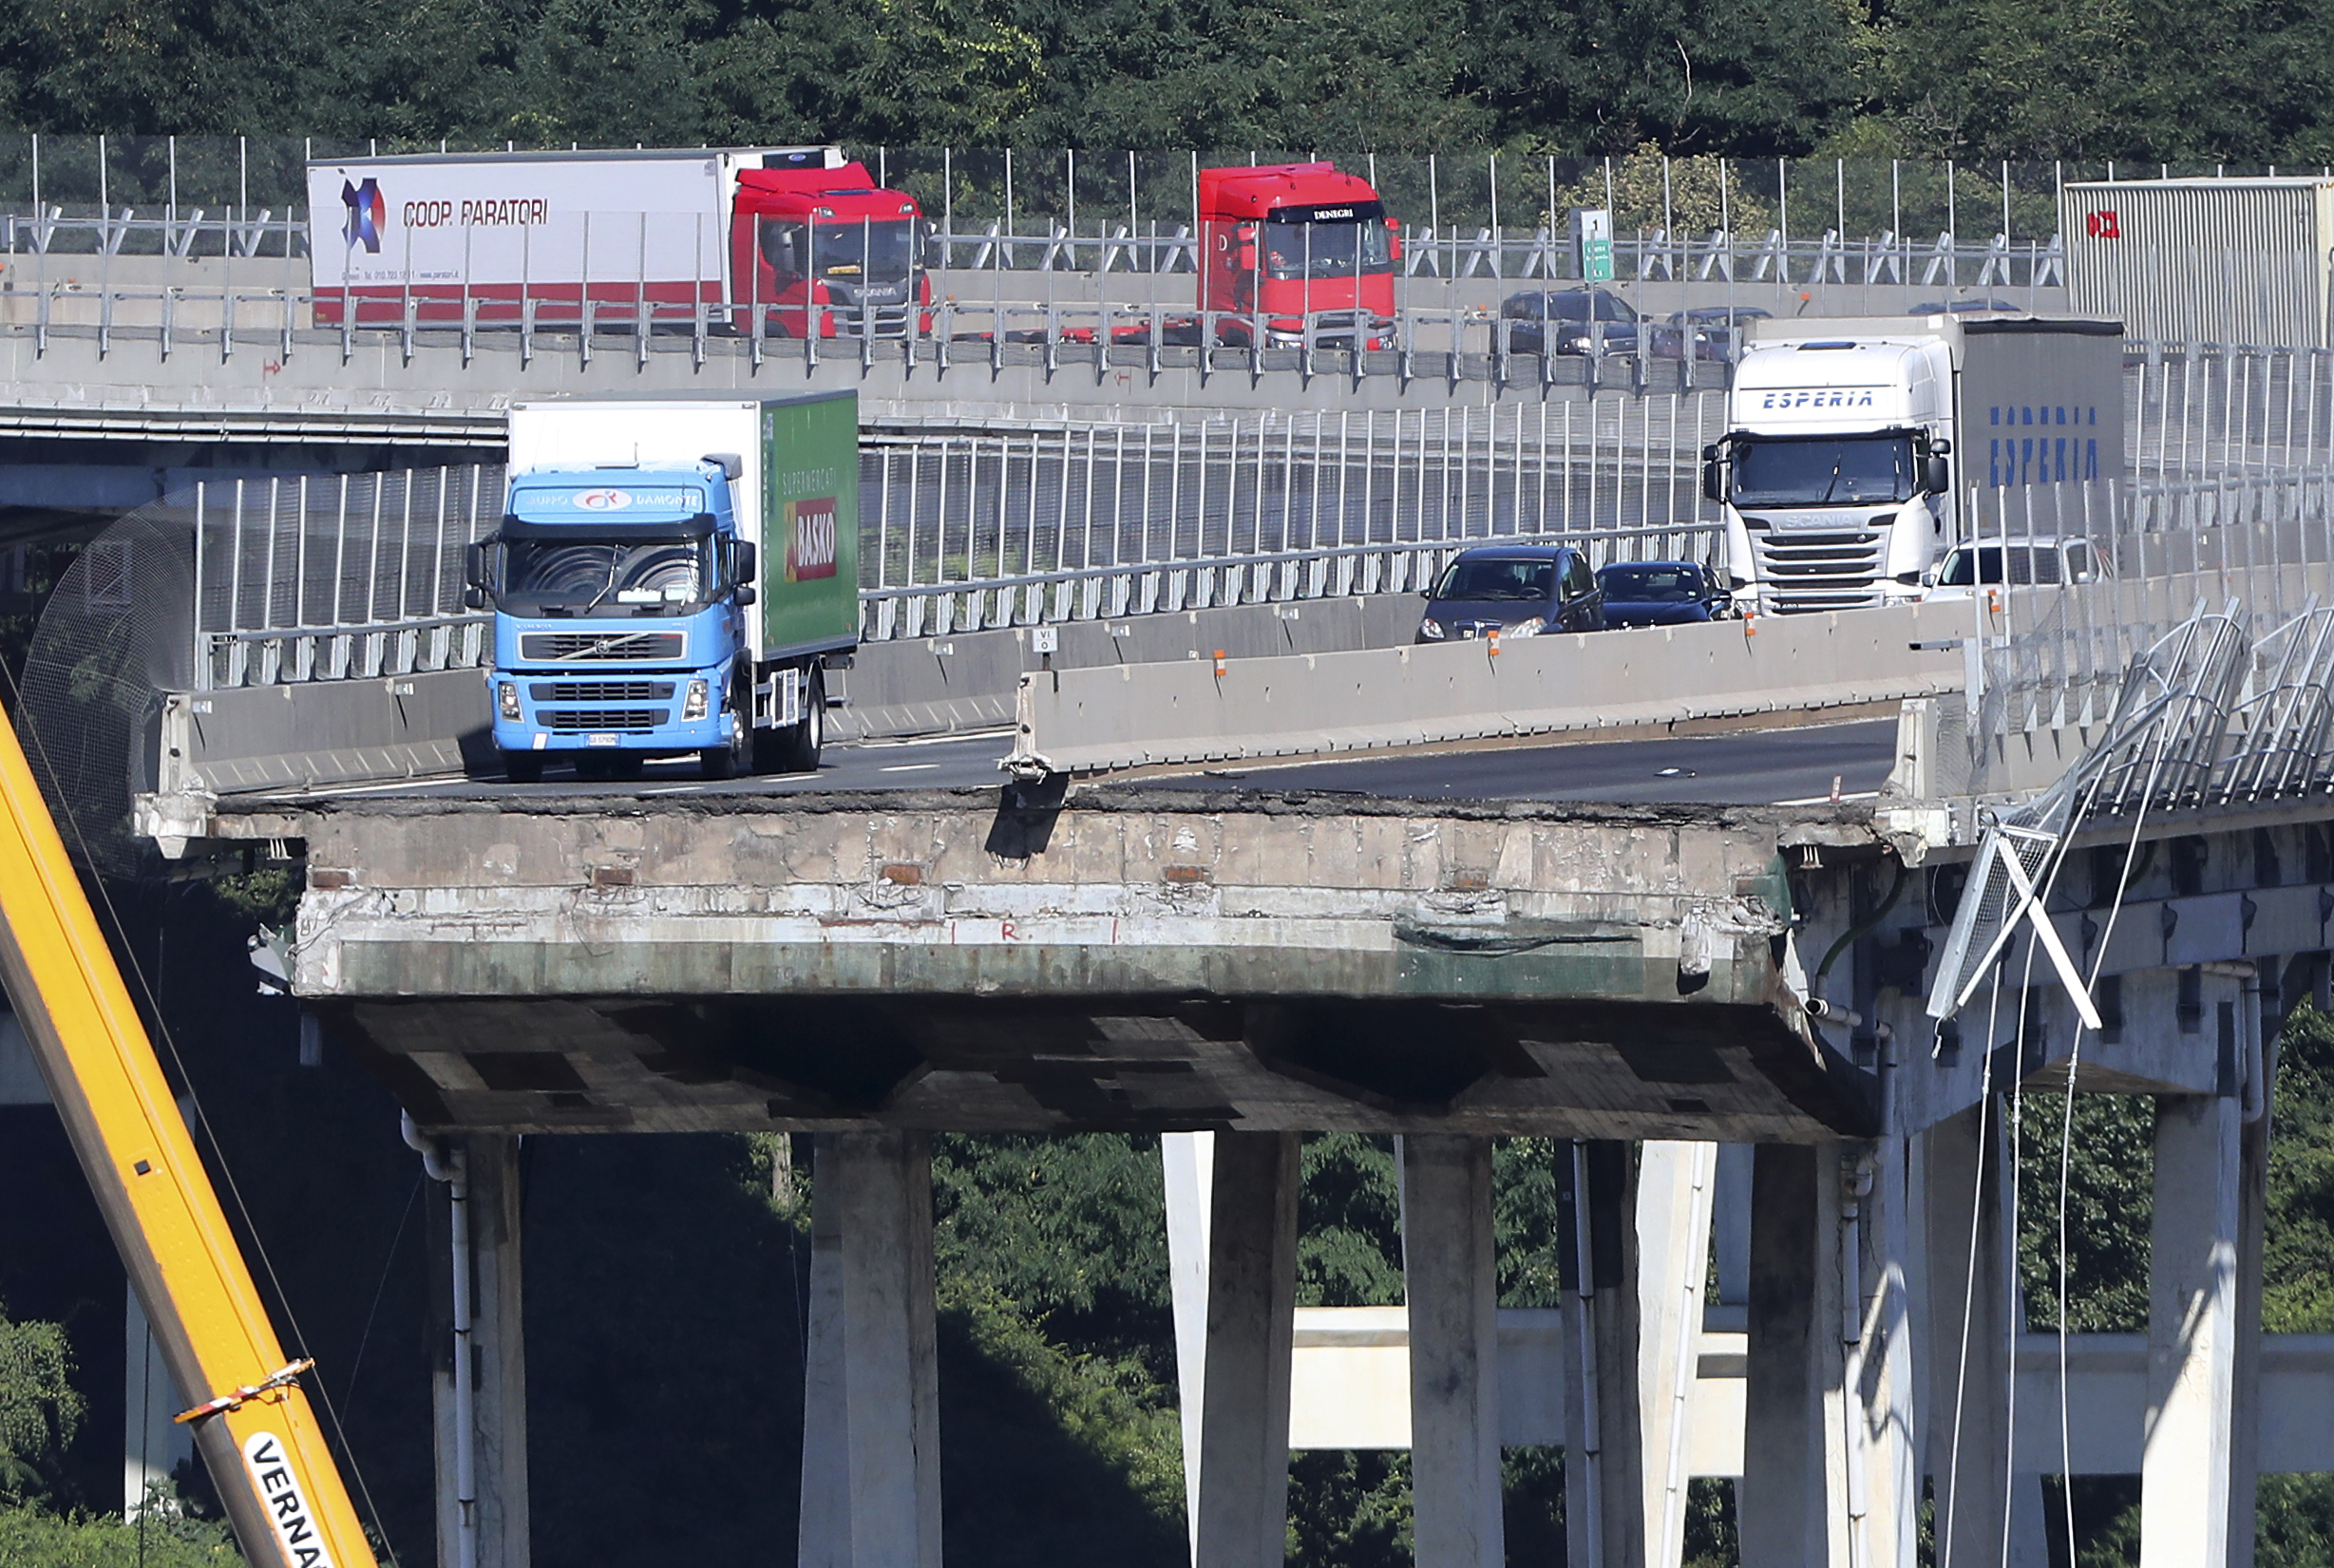 <div class='meta'><div class='origin-logo' data-origin='none'></div><span class='caption-text' data-credit='Antonio Calanni/AP Photo'>A view of the Morandi highway bridge that collapsed in Genoa, northern Italy, Wednesday, Aug. 15, 2018.</span></div>